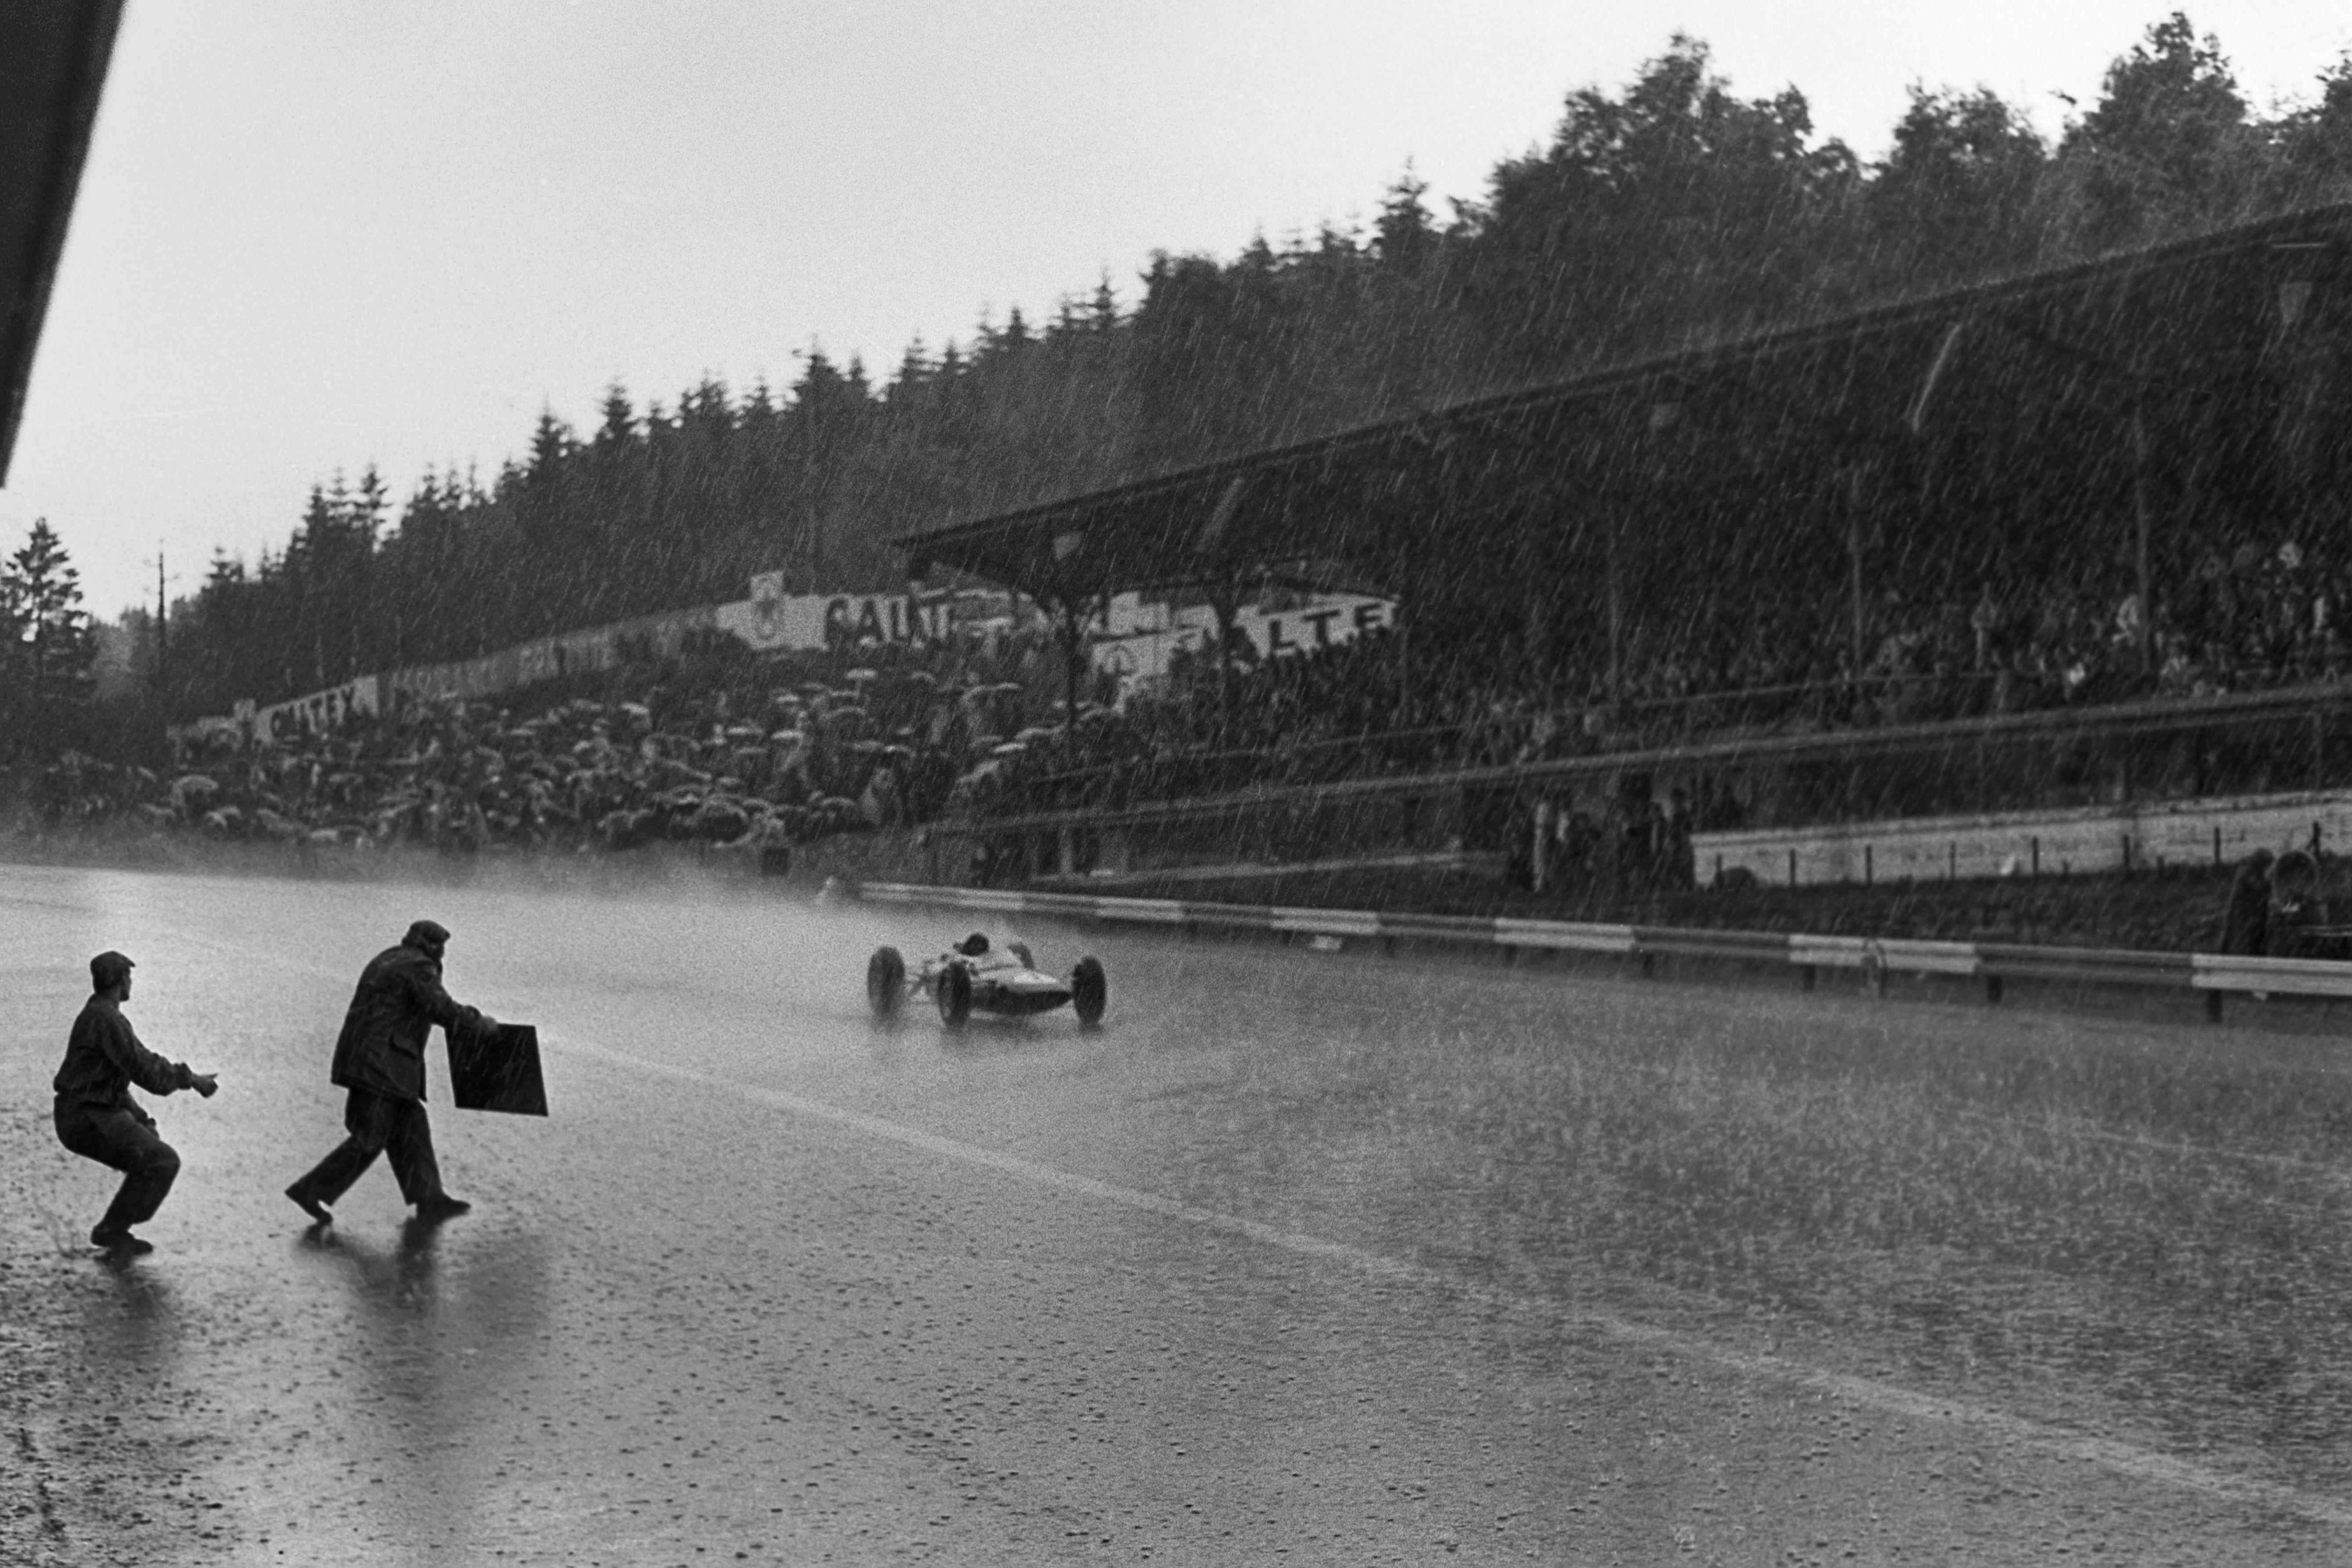 Jim Clark (Lotus) au Grand Prix de Belgique 1963